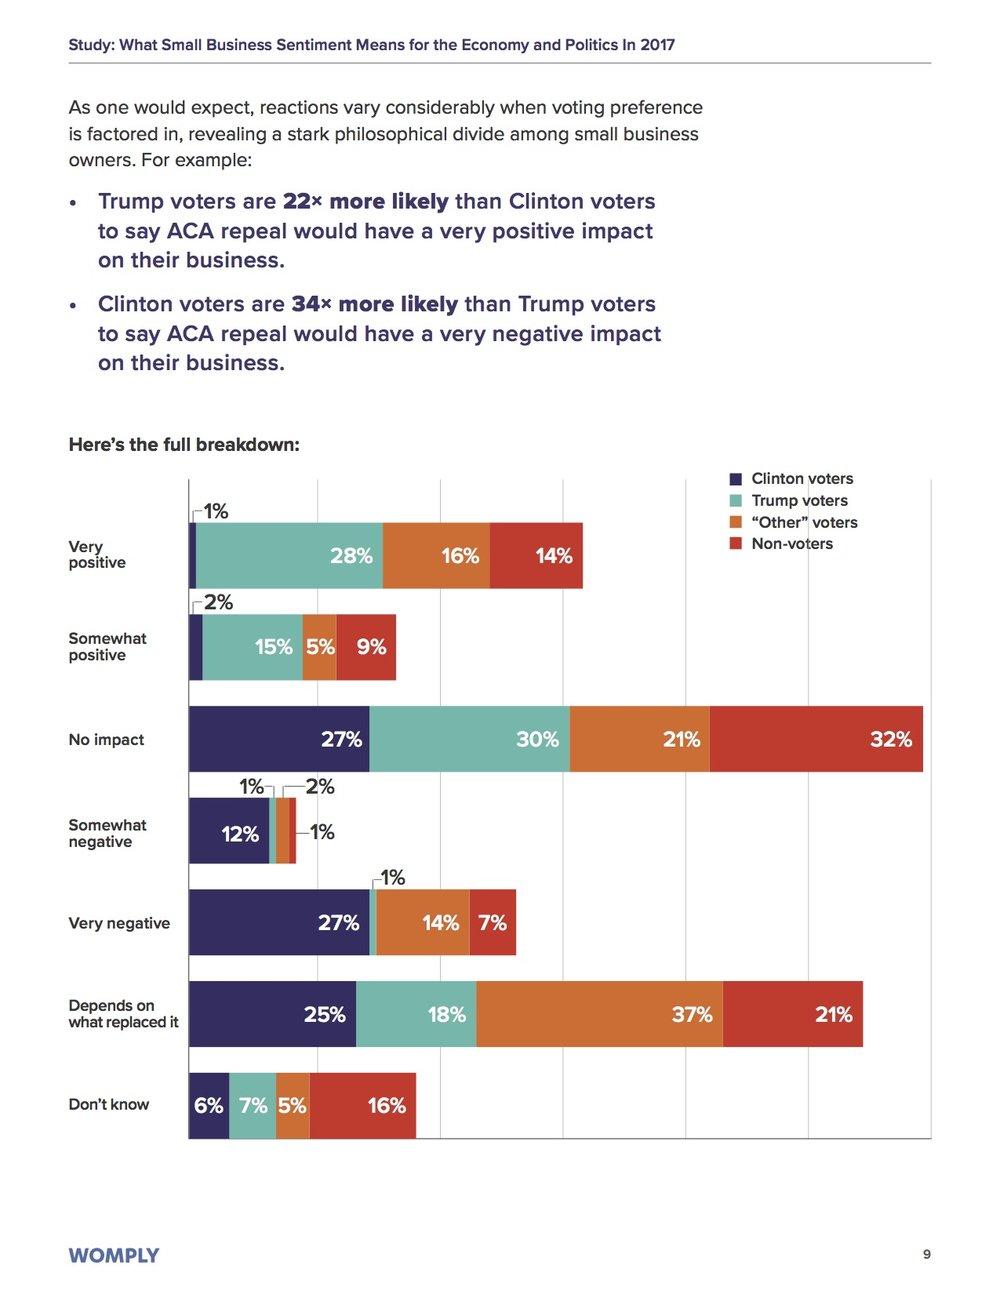 small-business-obamacare-healthcare-trump-clinton